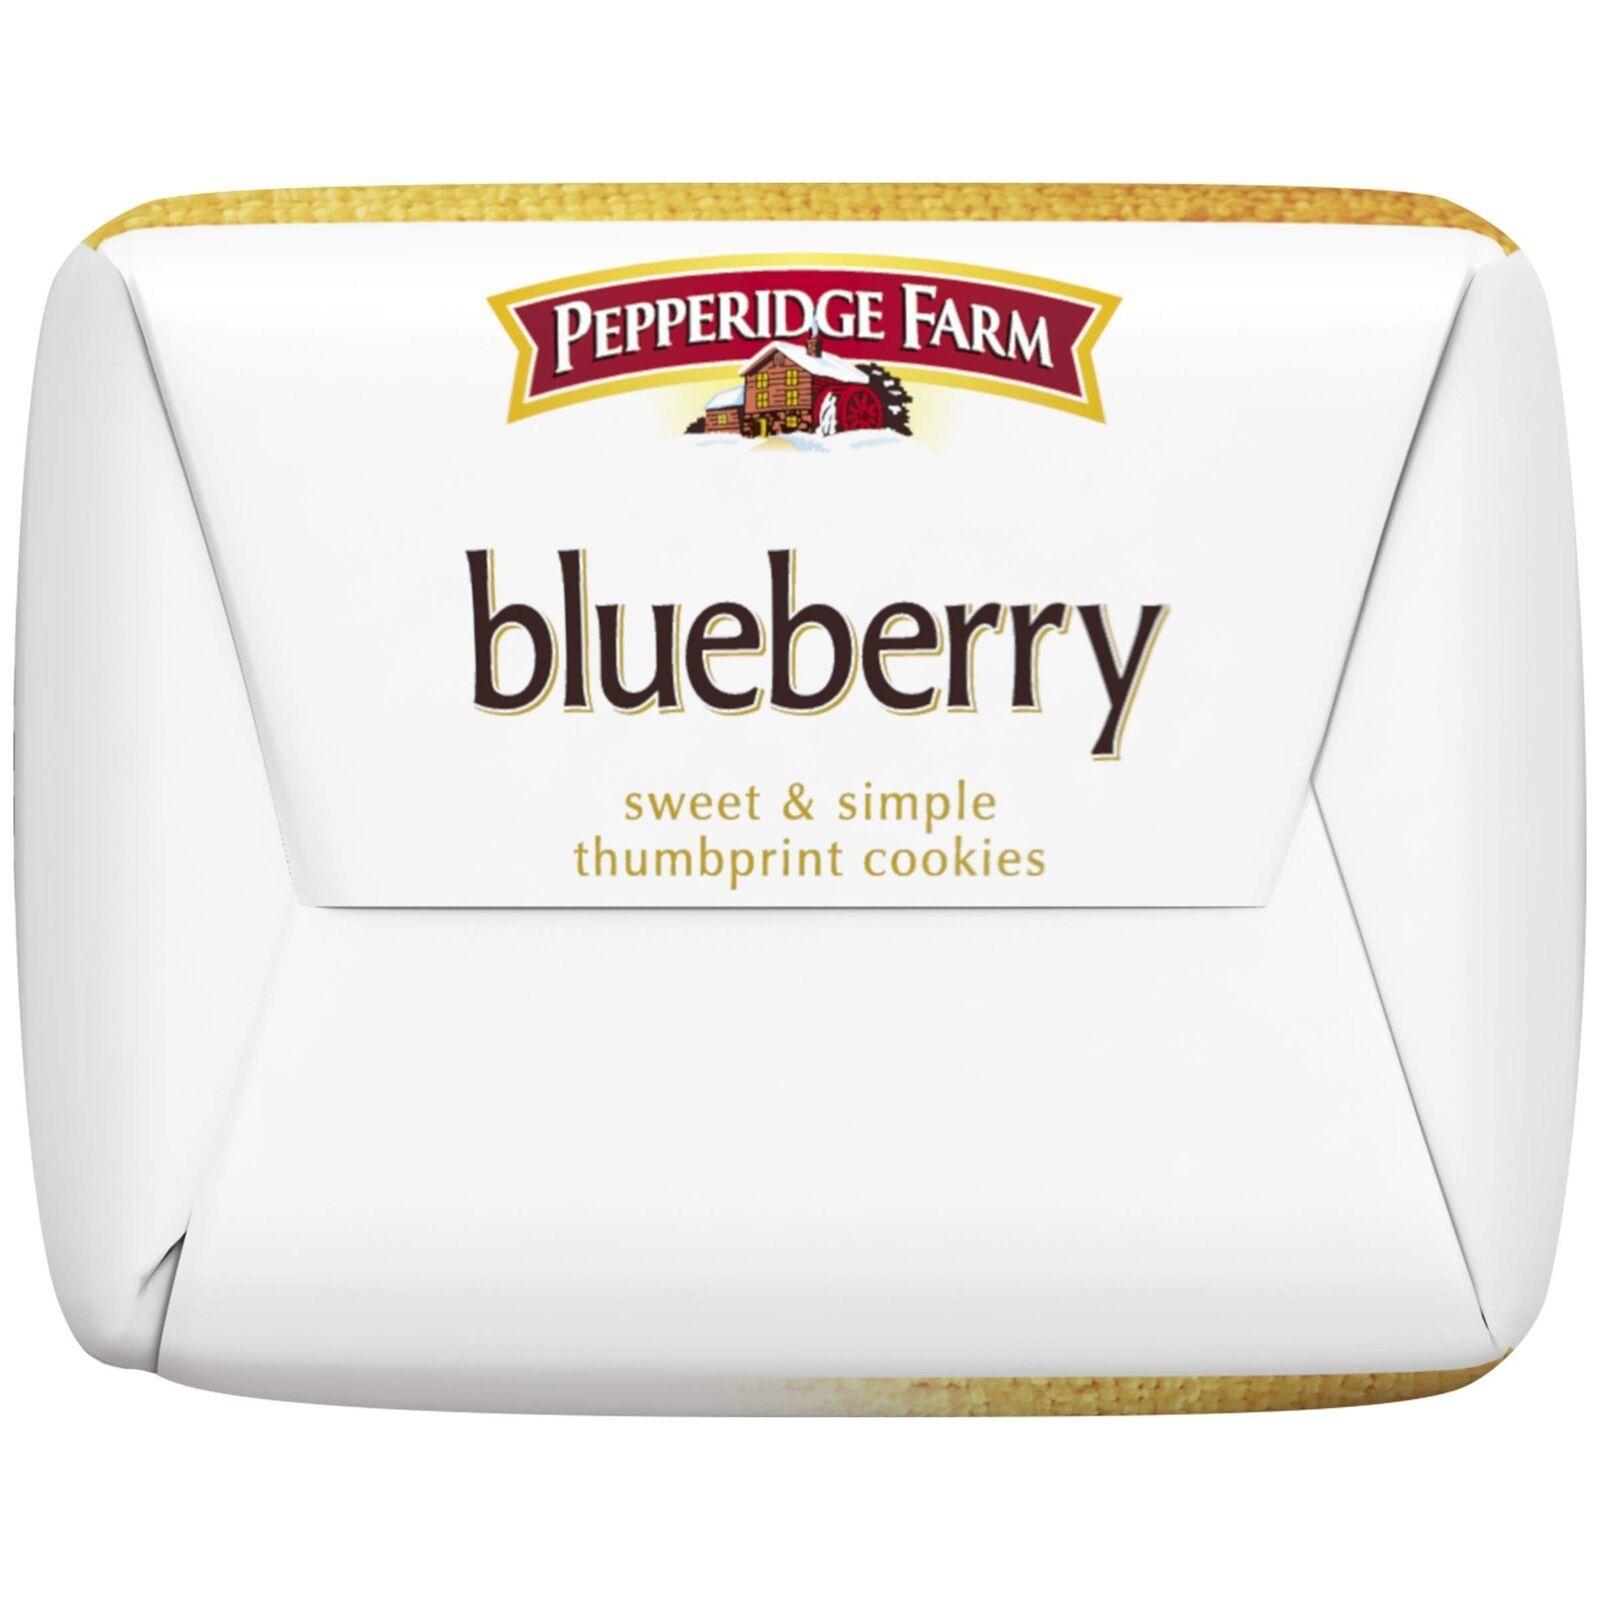 Pepperidge Farm Verona Blueberry Thumbprint Cookies, 6.75 oz image 3